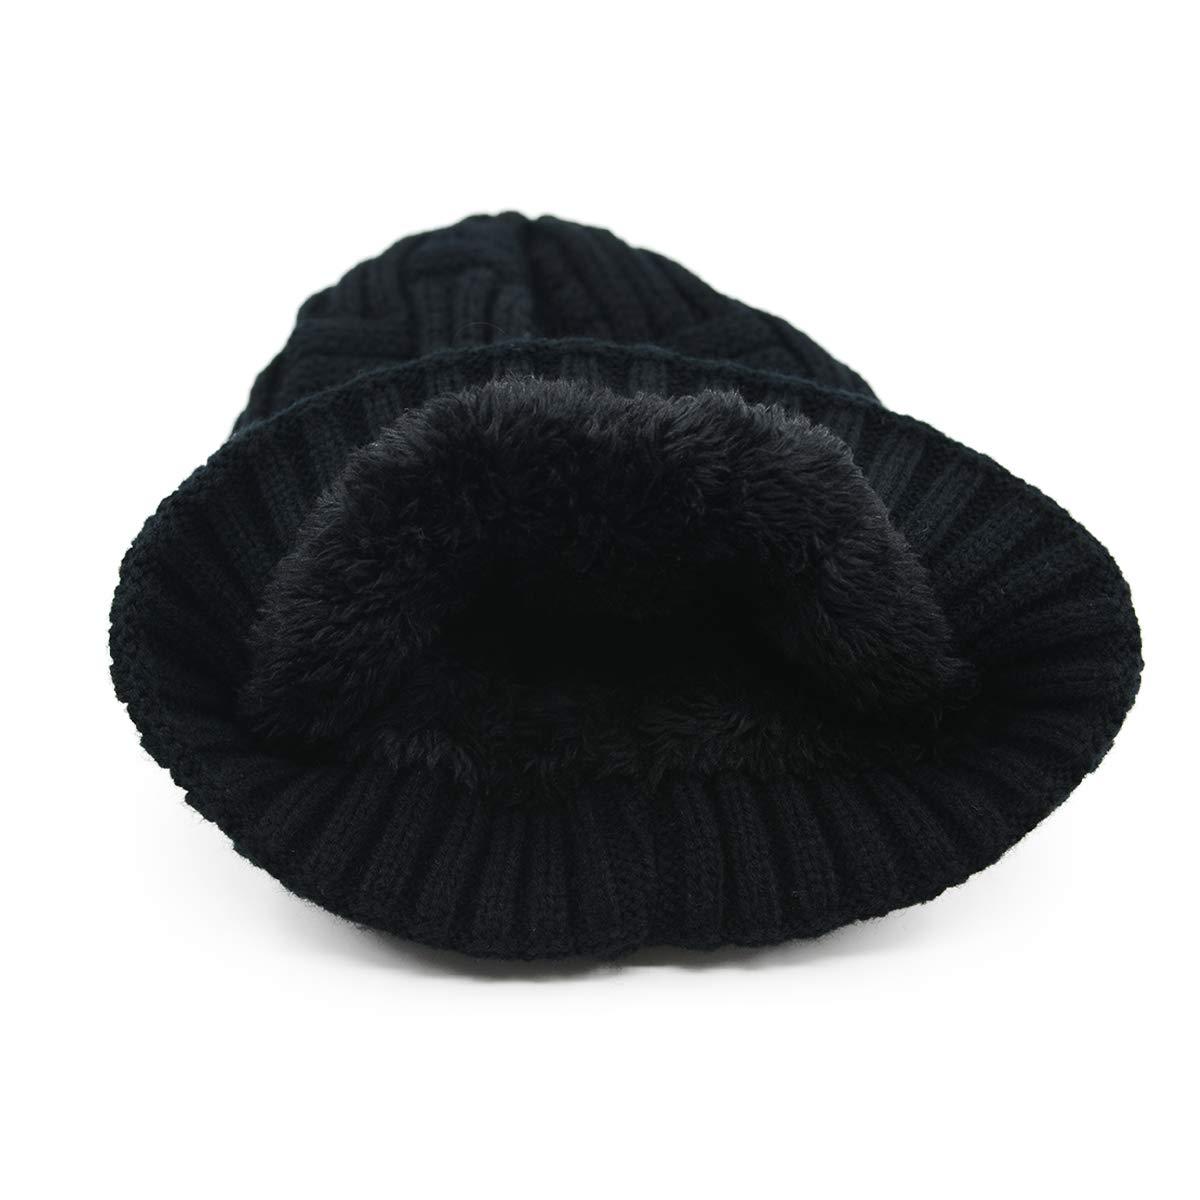 75fc890741e8e Amazon.com: American Trends Warm Chunky Beanie for Women & Men Wool  Knitting Hat Soft Baggy Slouchy Hats Skull Cap Classic Black: Clothing